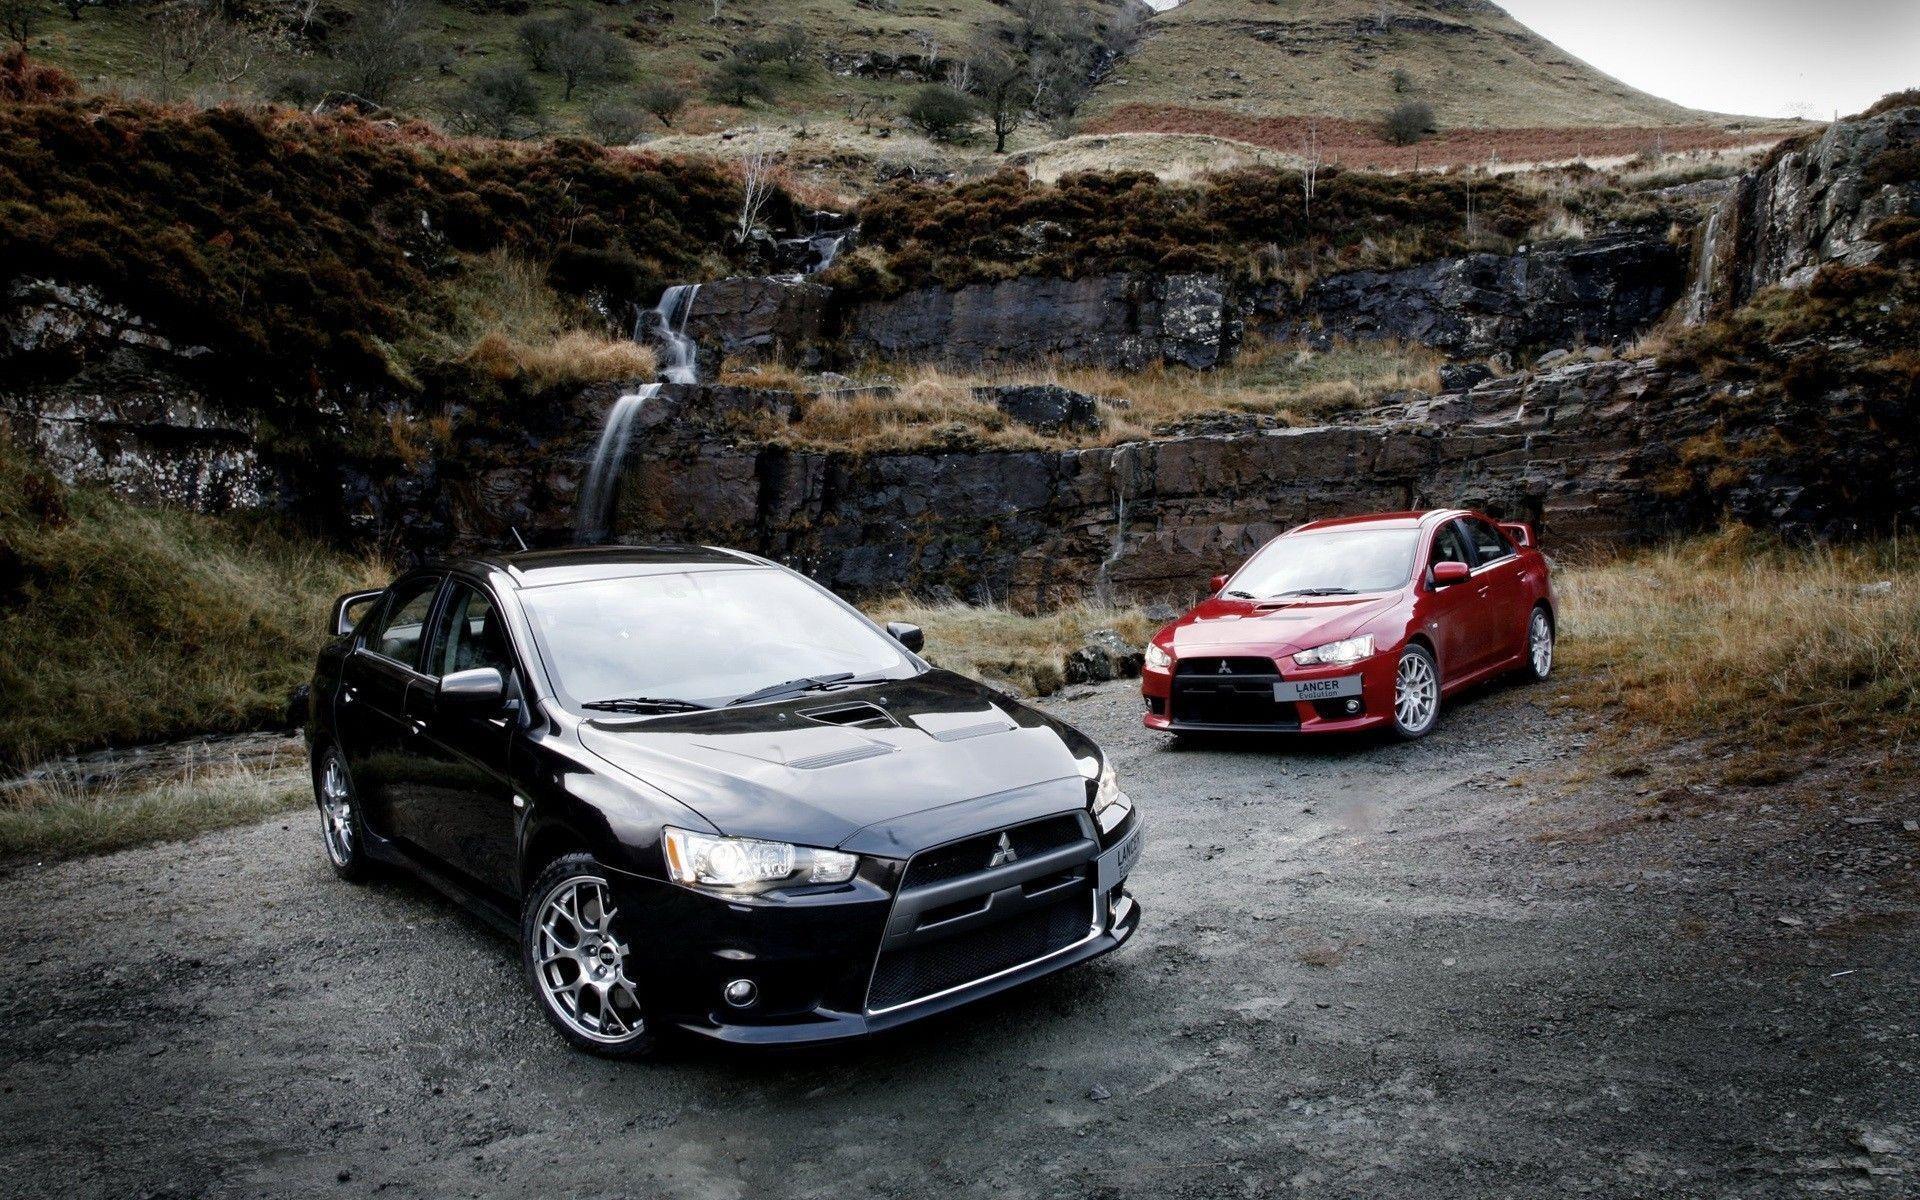 Mitsubishi Lancer Evolution X Wallpapers